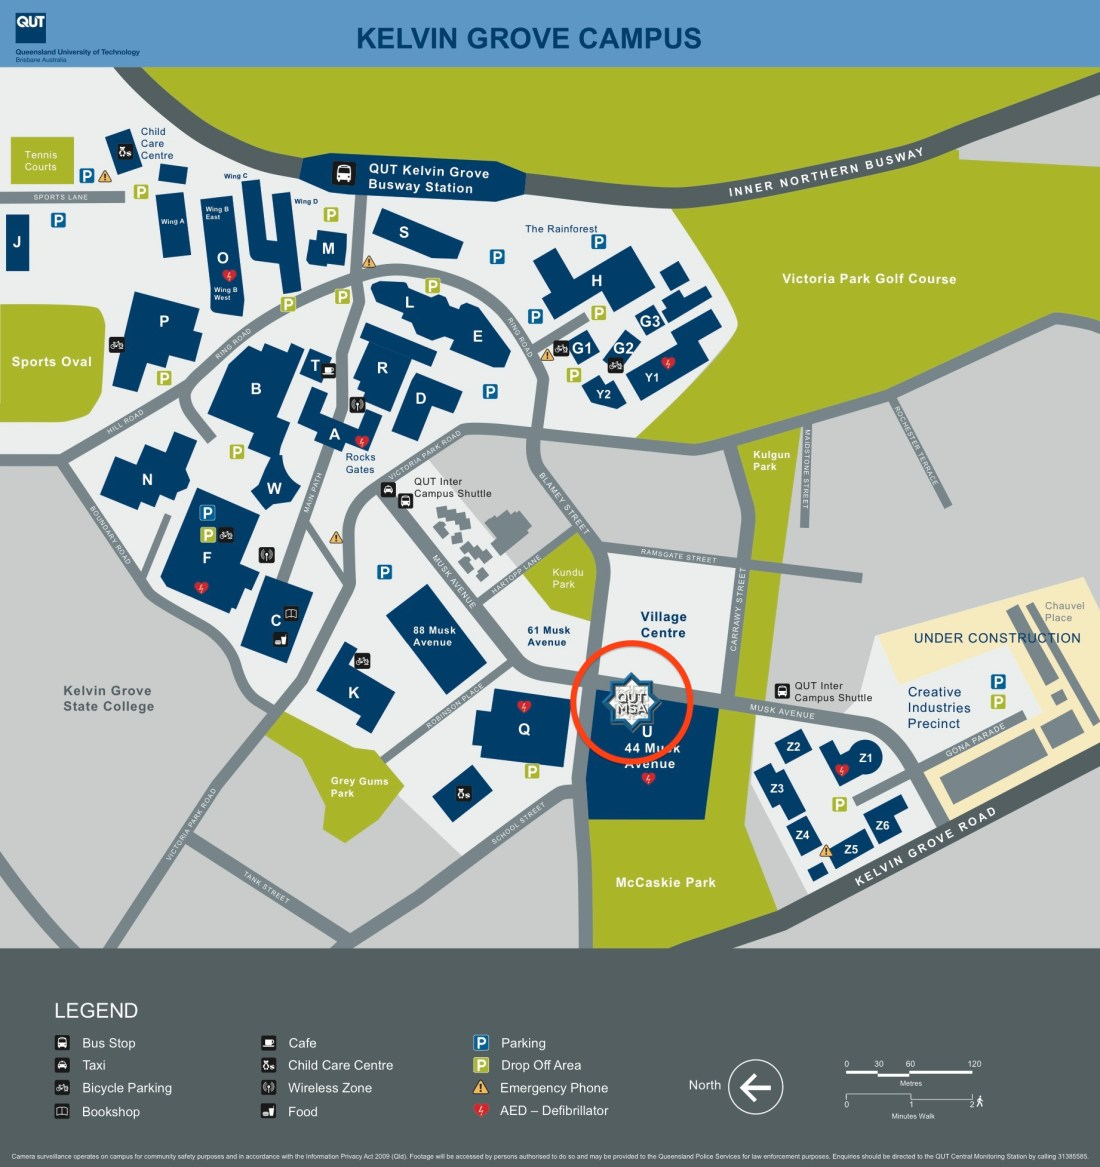 QUT Kelvin Grove campus jumuah location